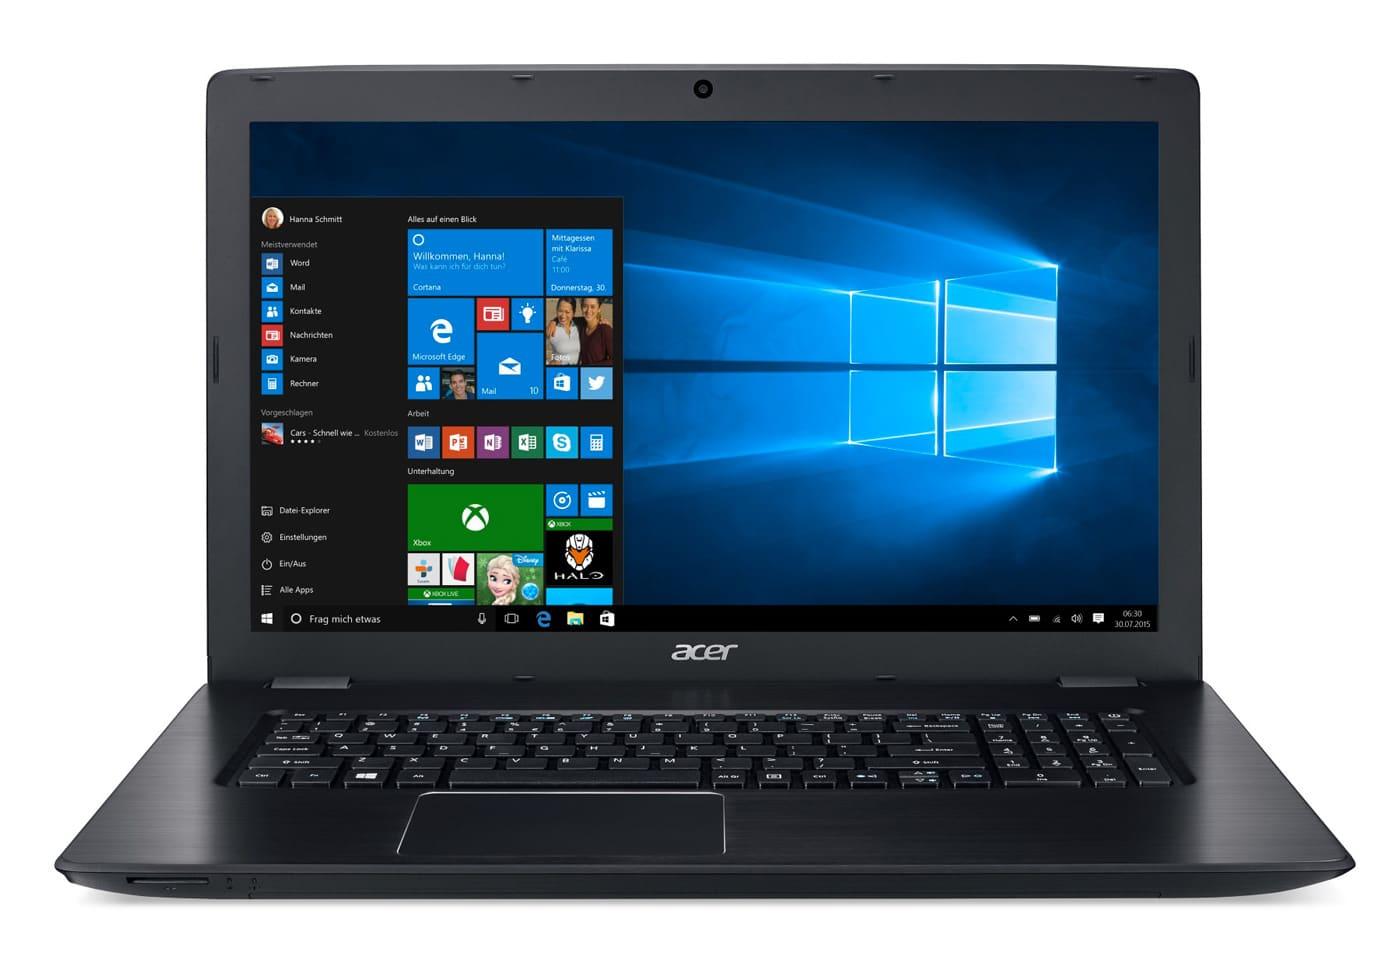 "Acer Aspire E5-774G-5563 à 699€, PC portable 17"" Full Kaby Lake i5 SSD 940MX"